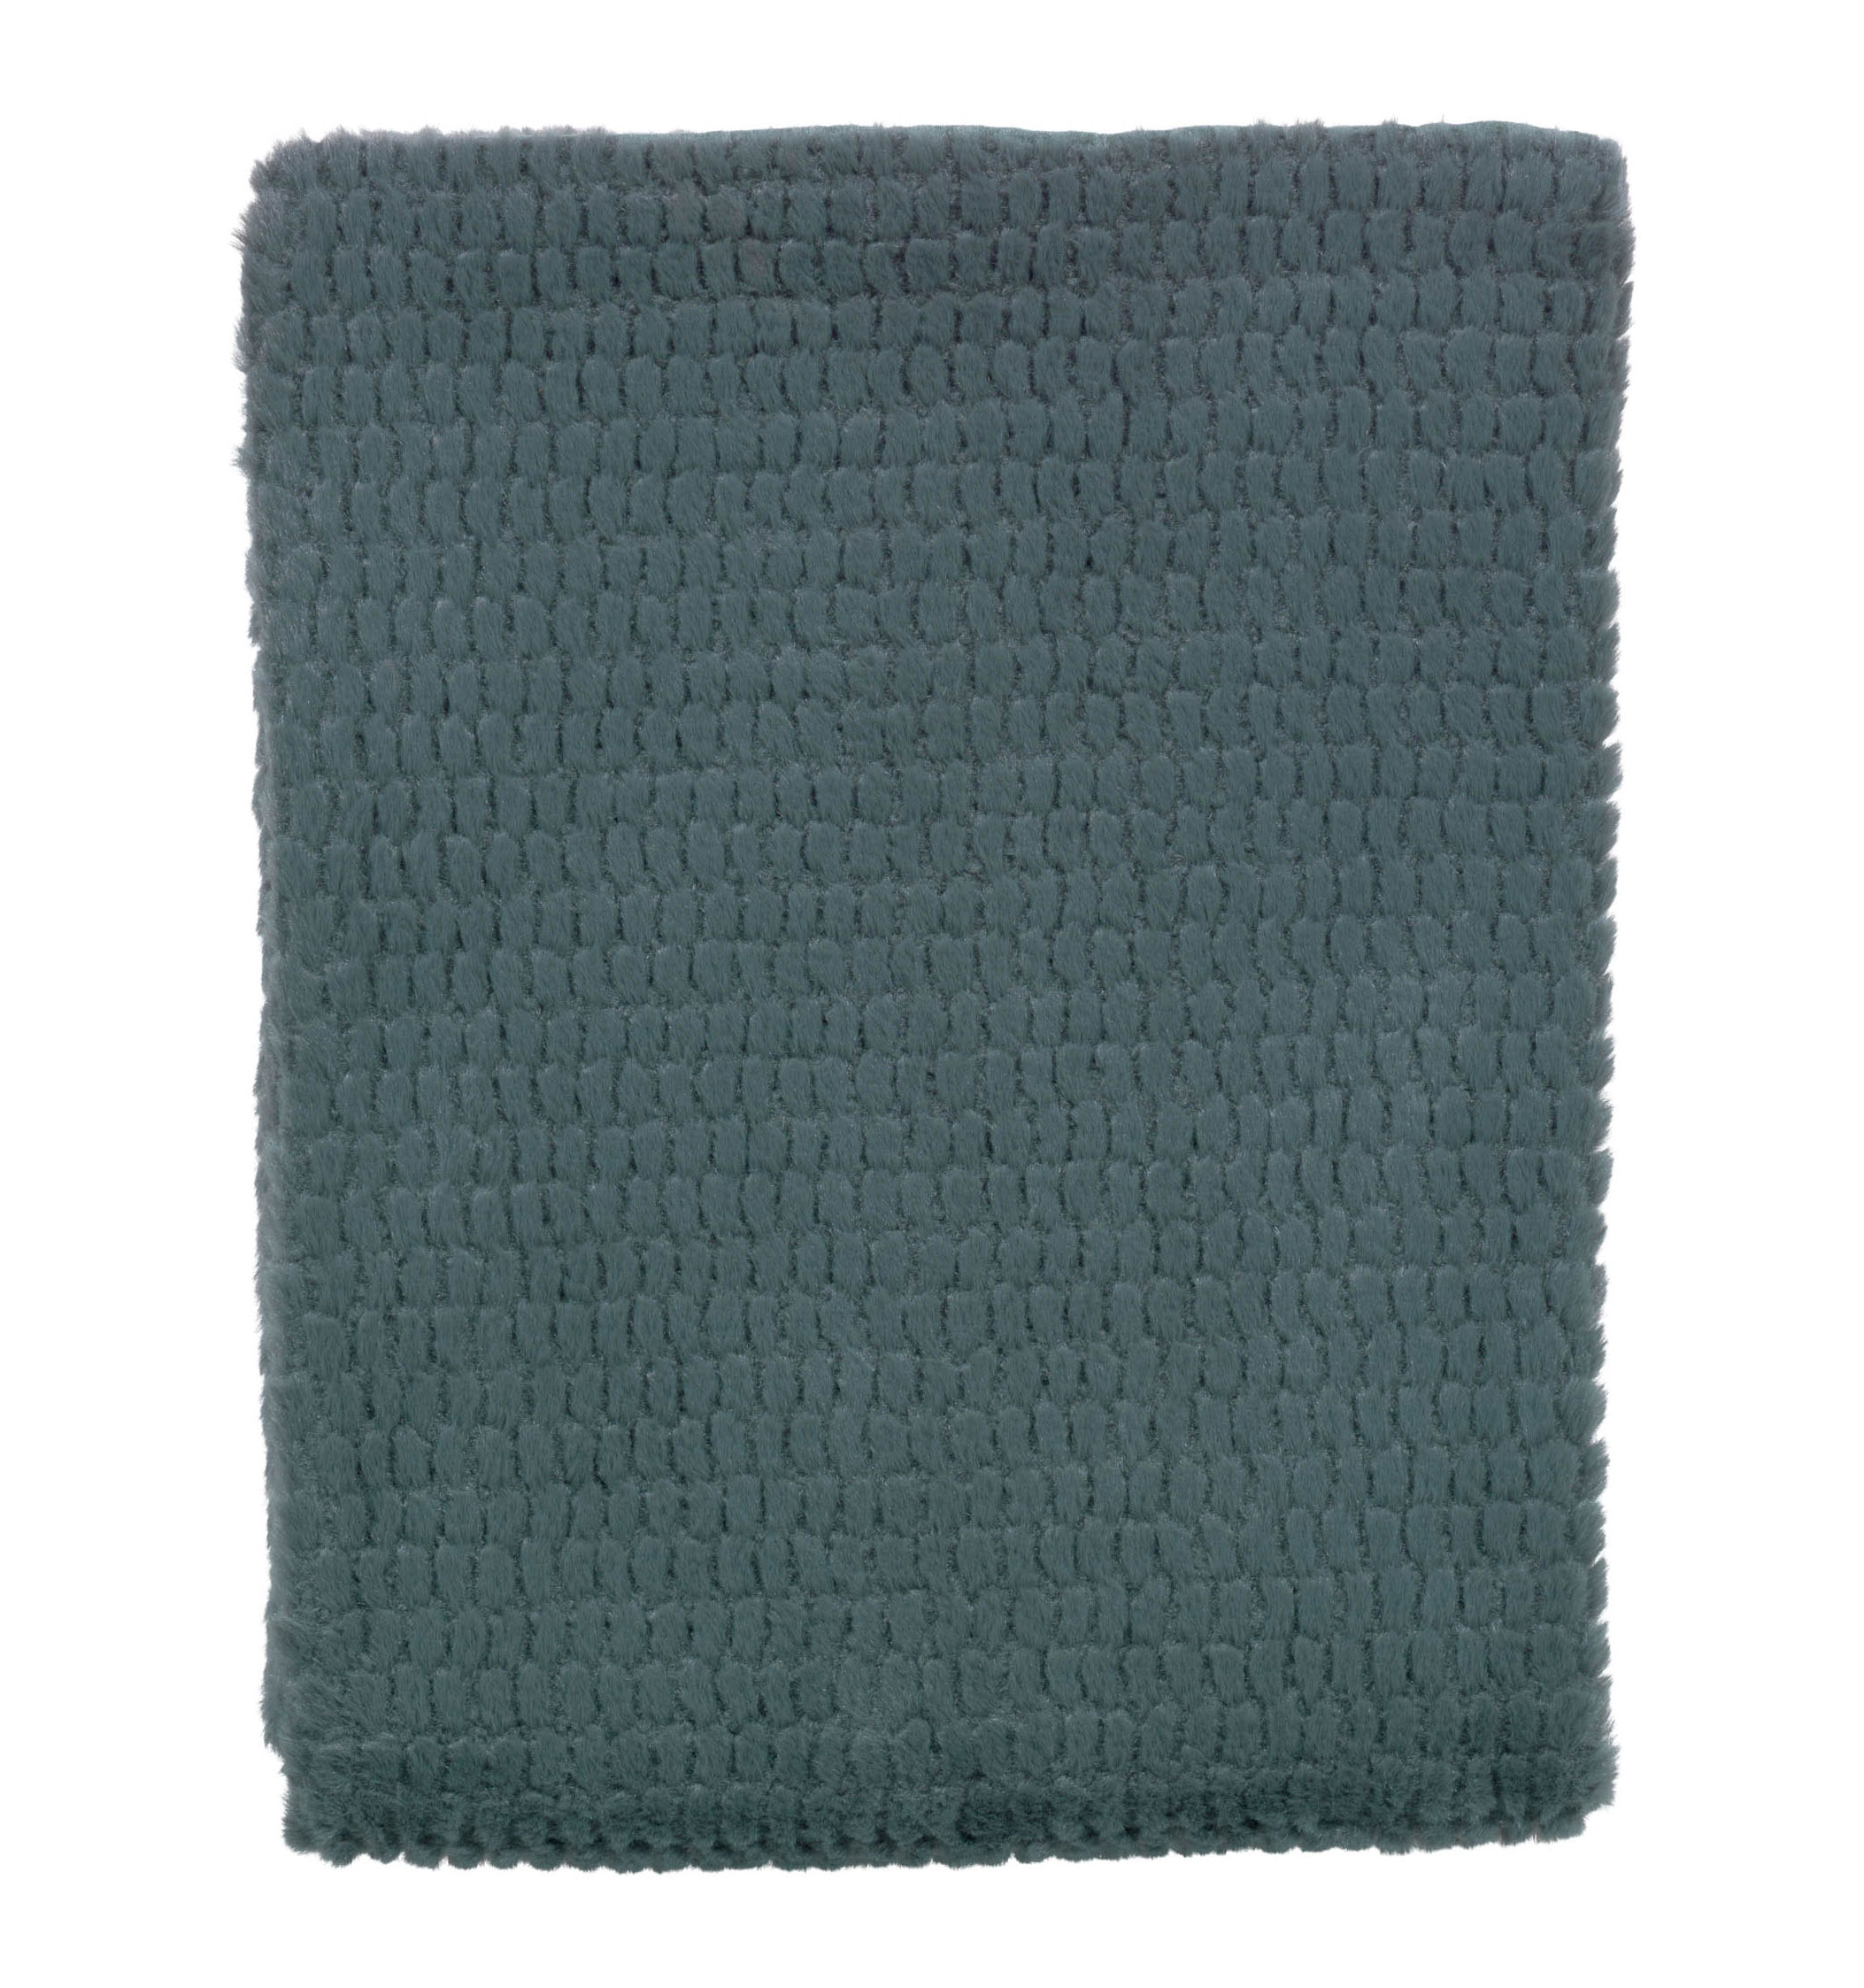 TIMY - Plaid groen 130x180 cm